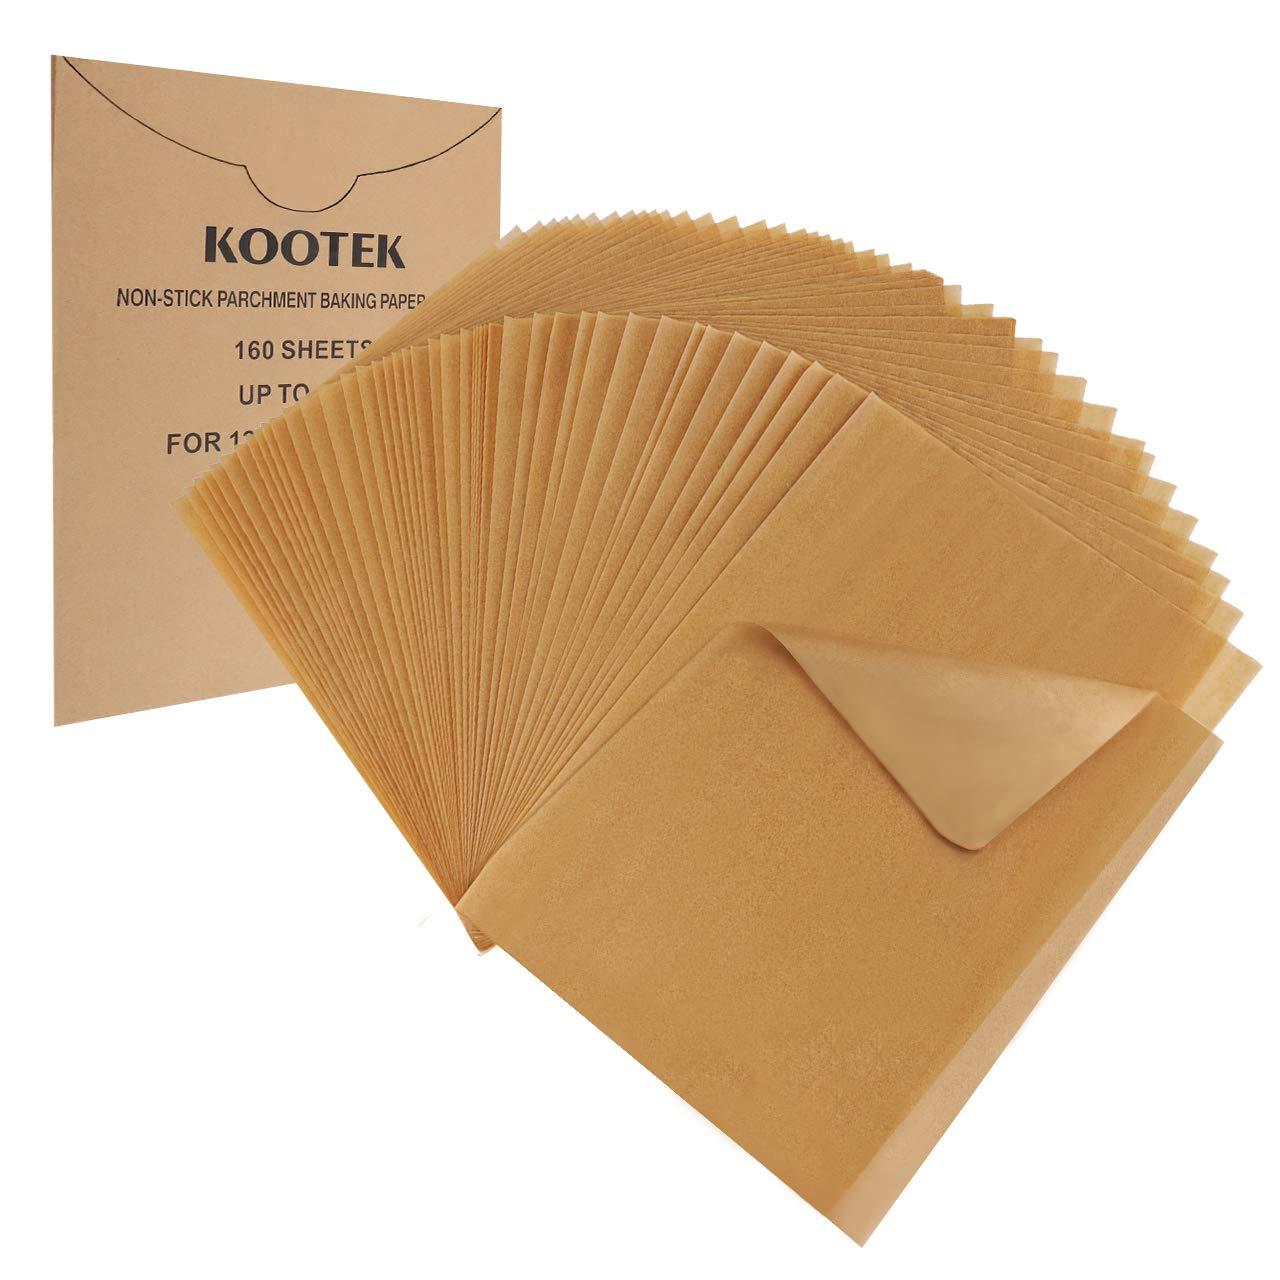 Kootek 160 Pcs Parchment Paper Unbleached Baking Sheets Pre-cut Parchments Sheet Liner, Non-stick for Baking Cooking Steaming